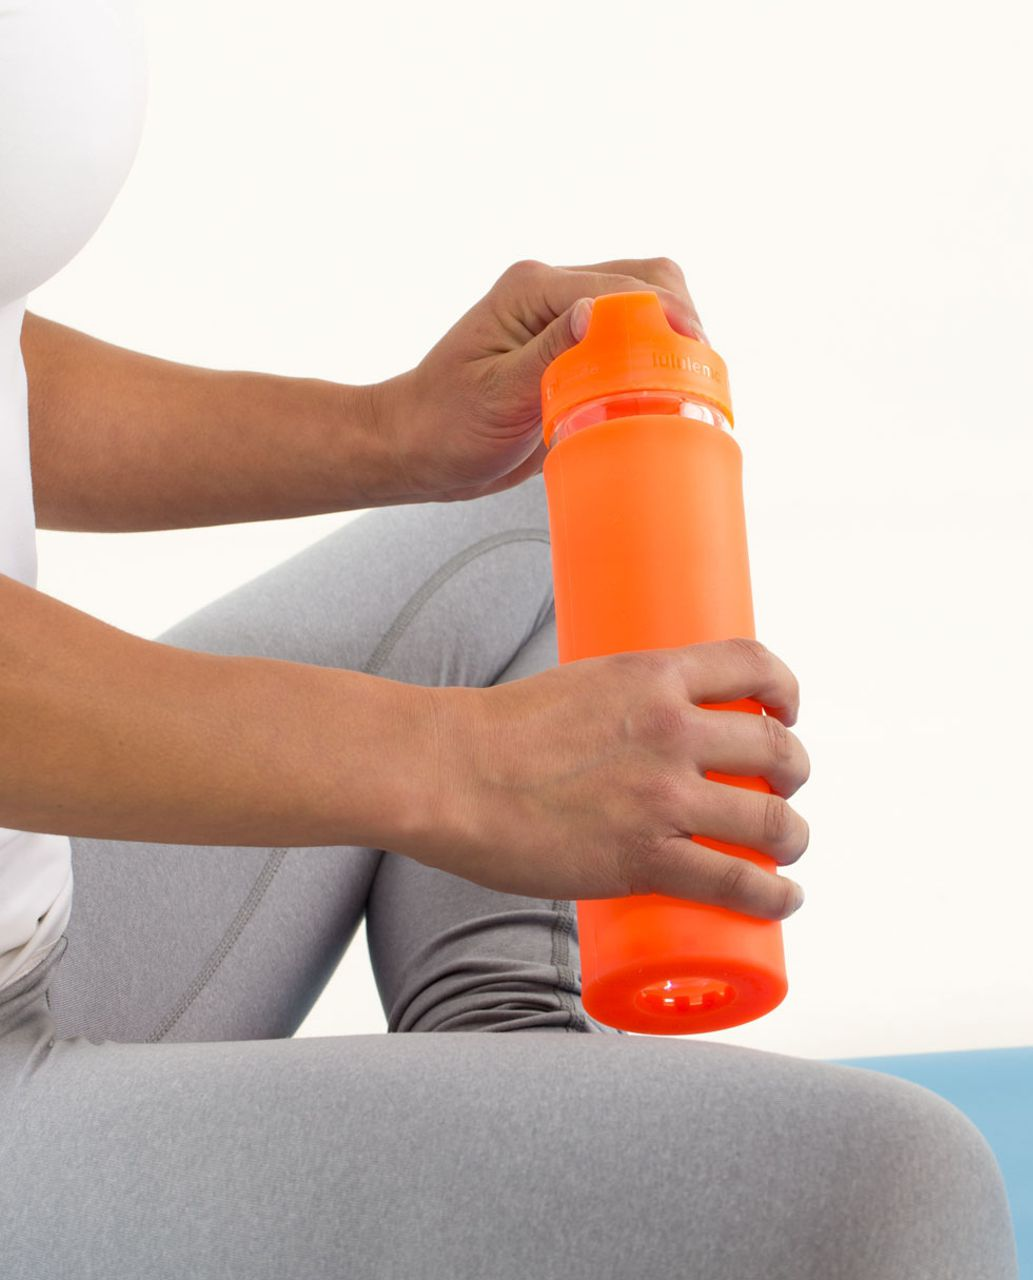 Lululemon Pure Balance Water Bottle - Pizzaz